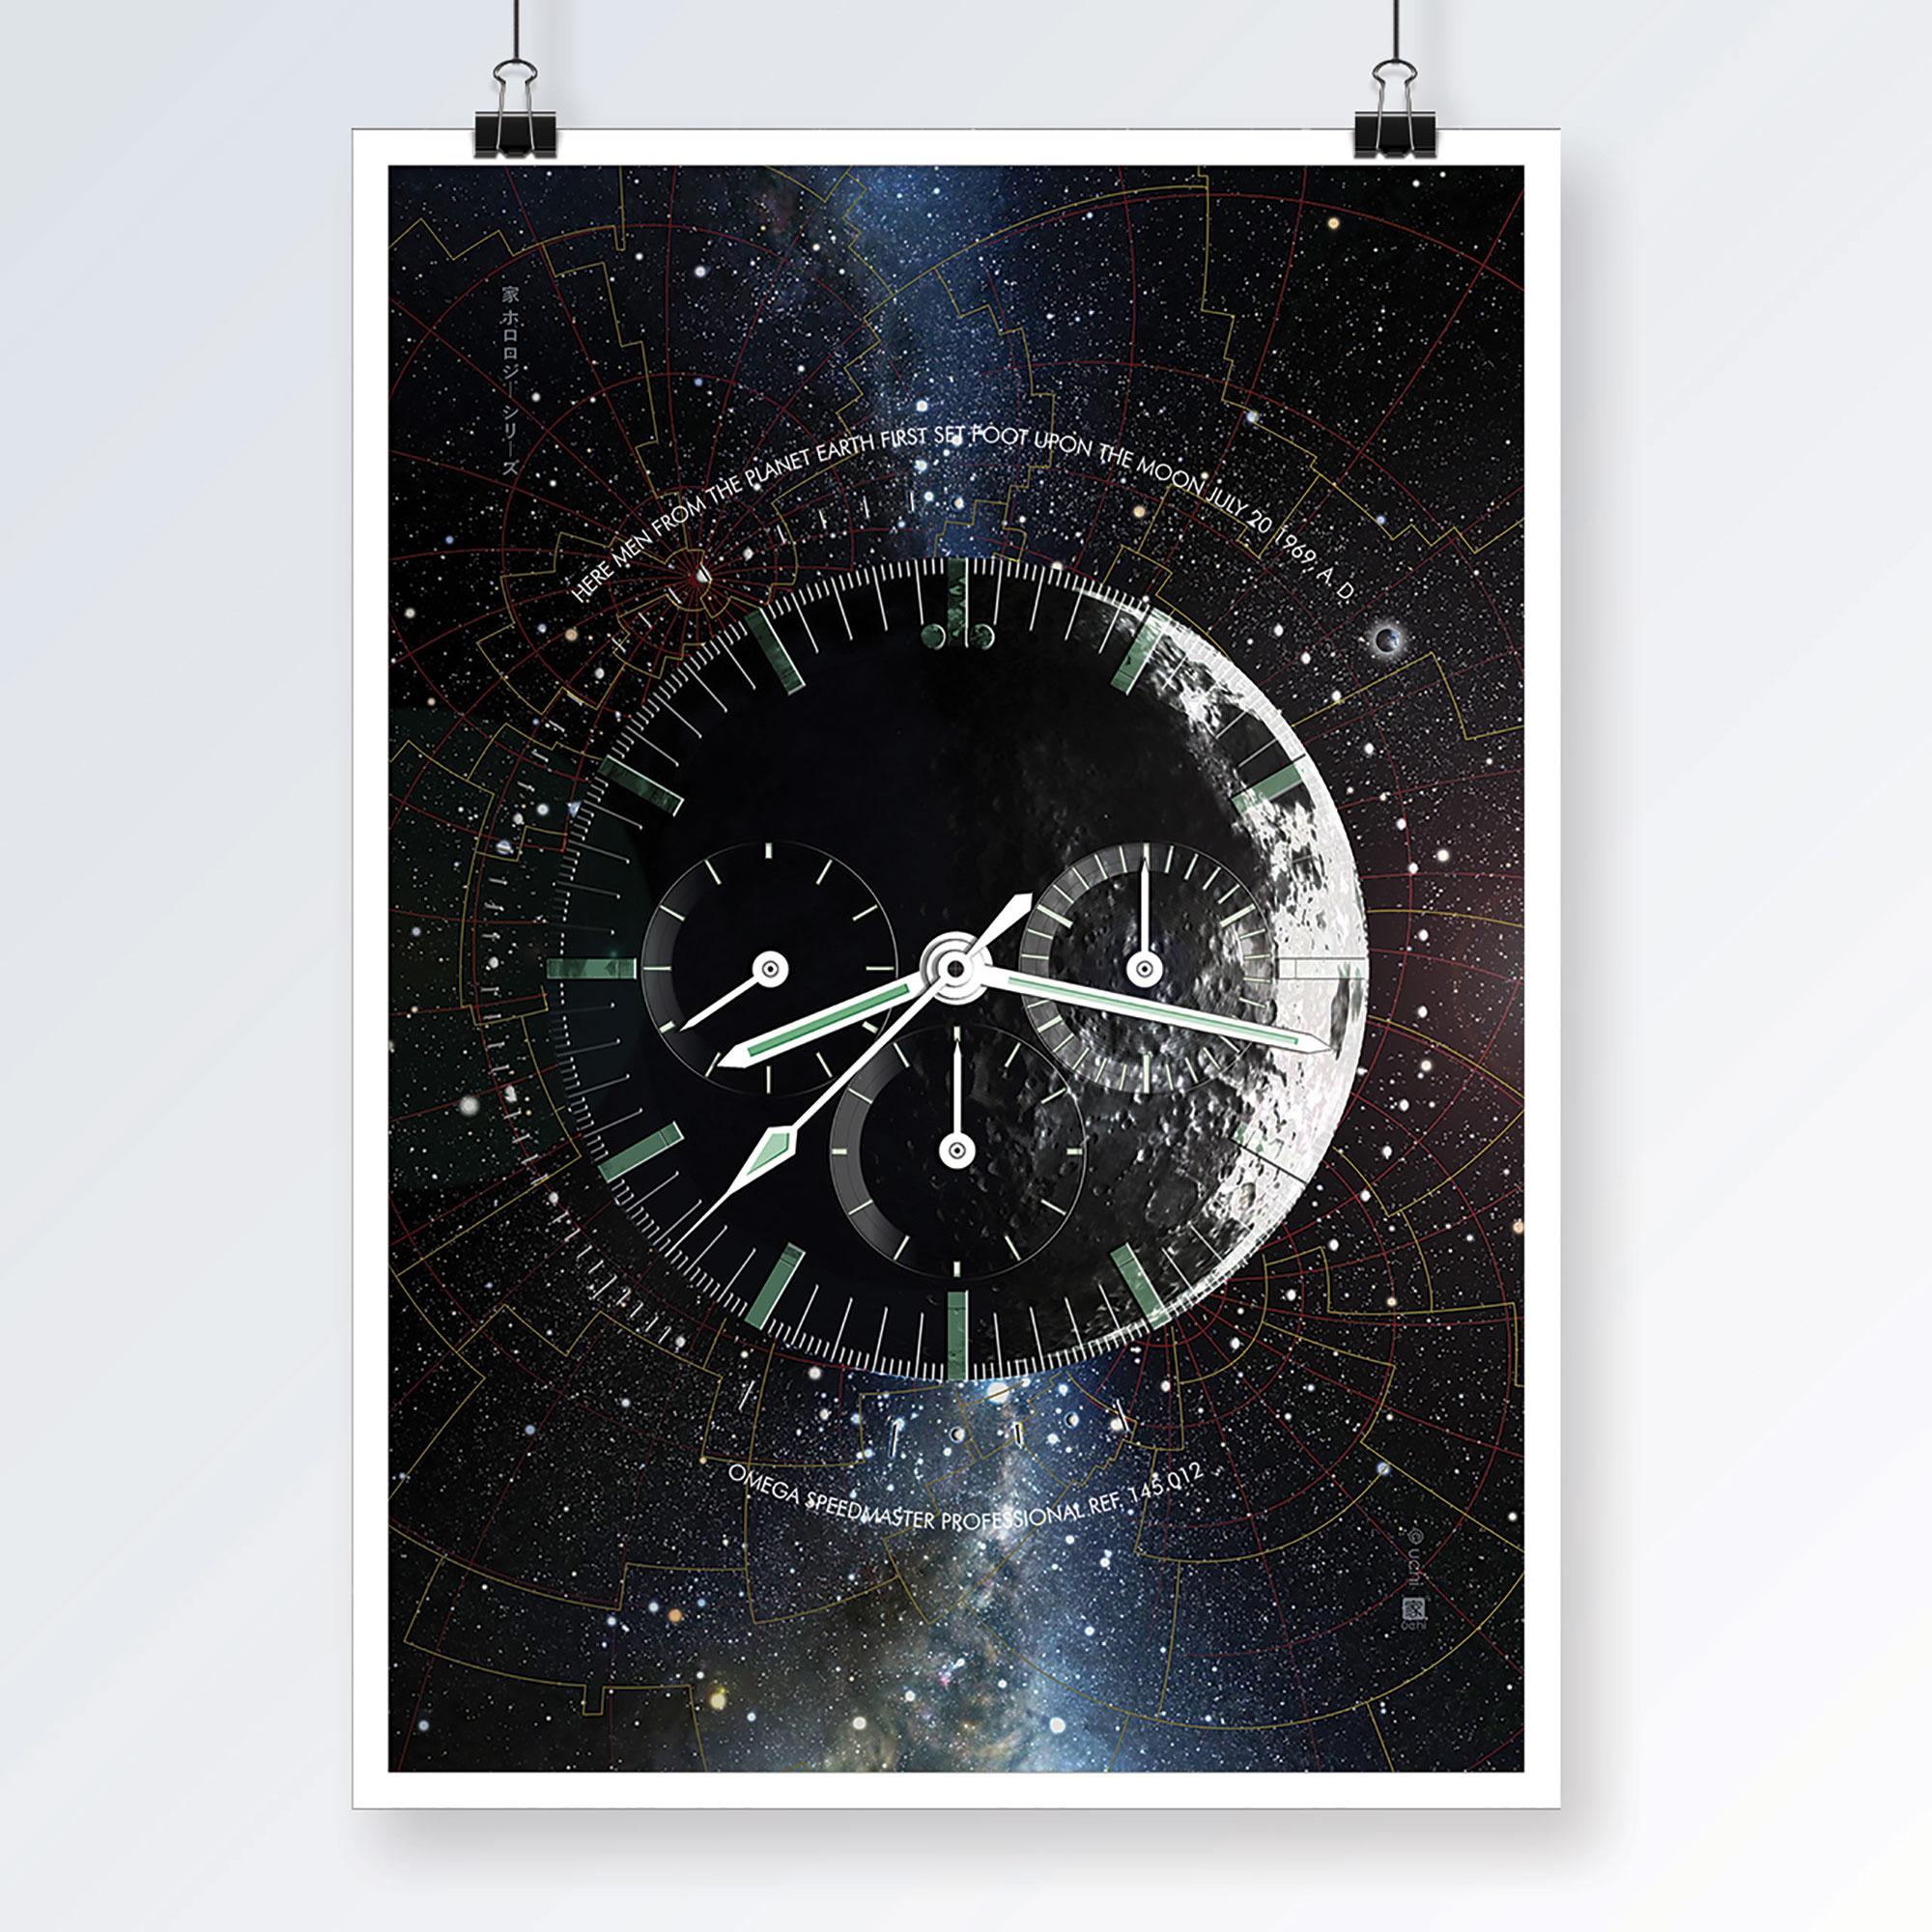 OMEGA Speedmaster Moonwatch art print - uchi horology series